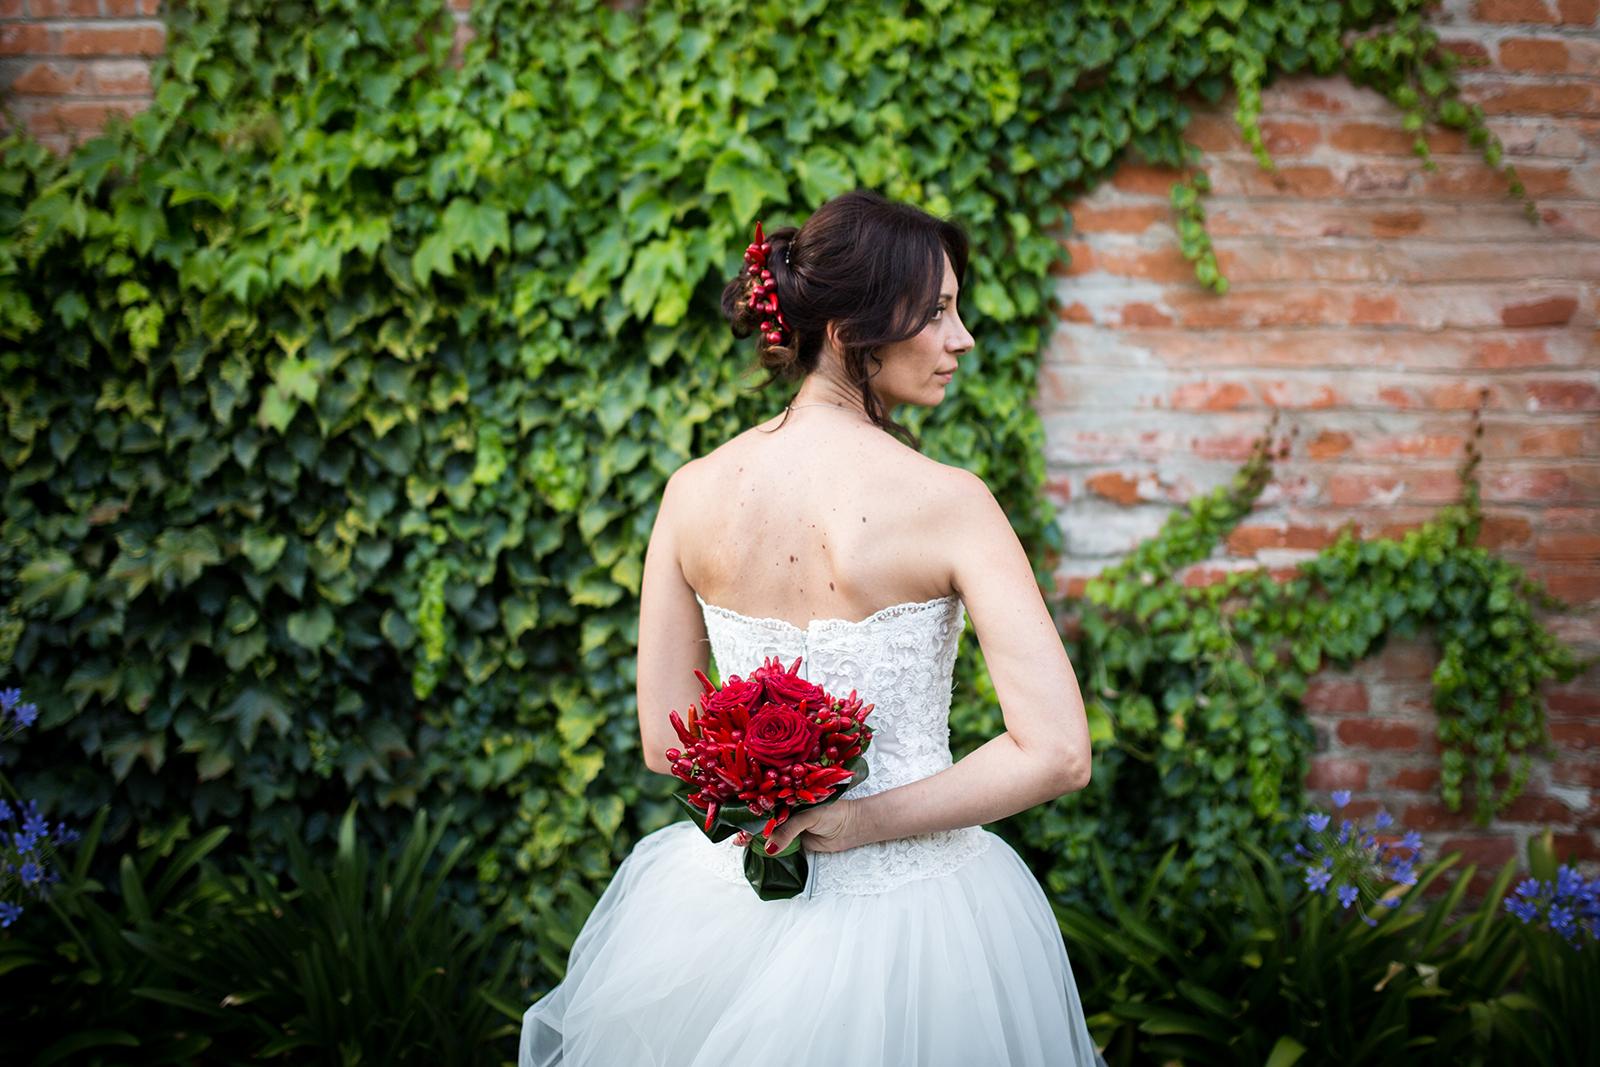 Fotografo matrimonio wedding reportage brescia